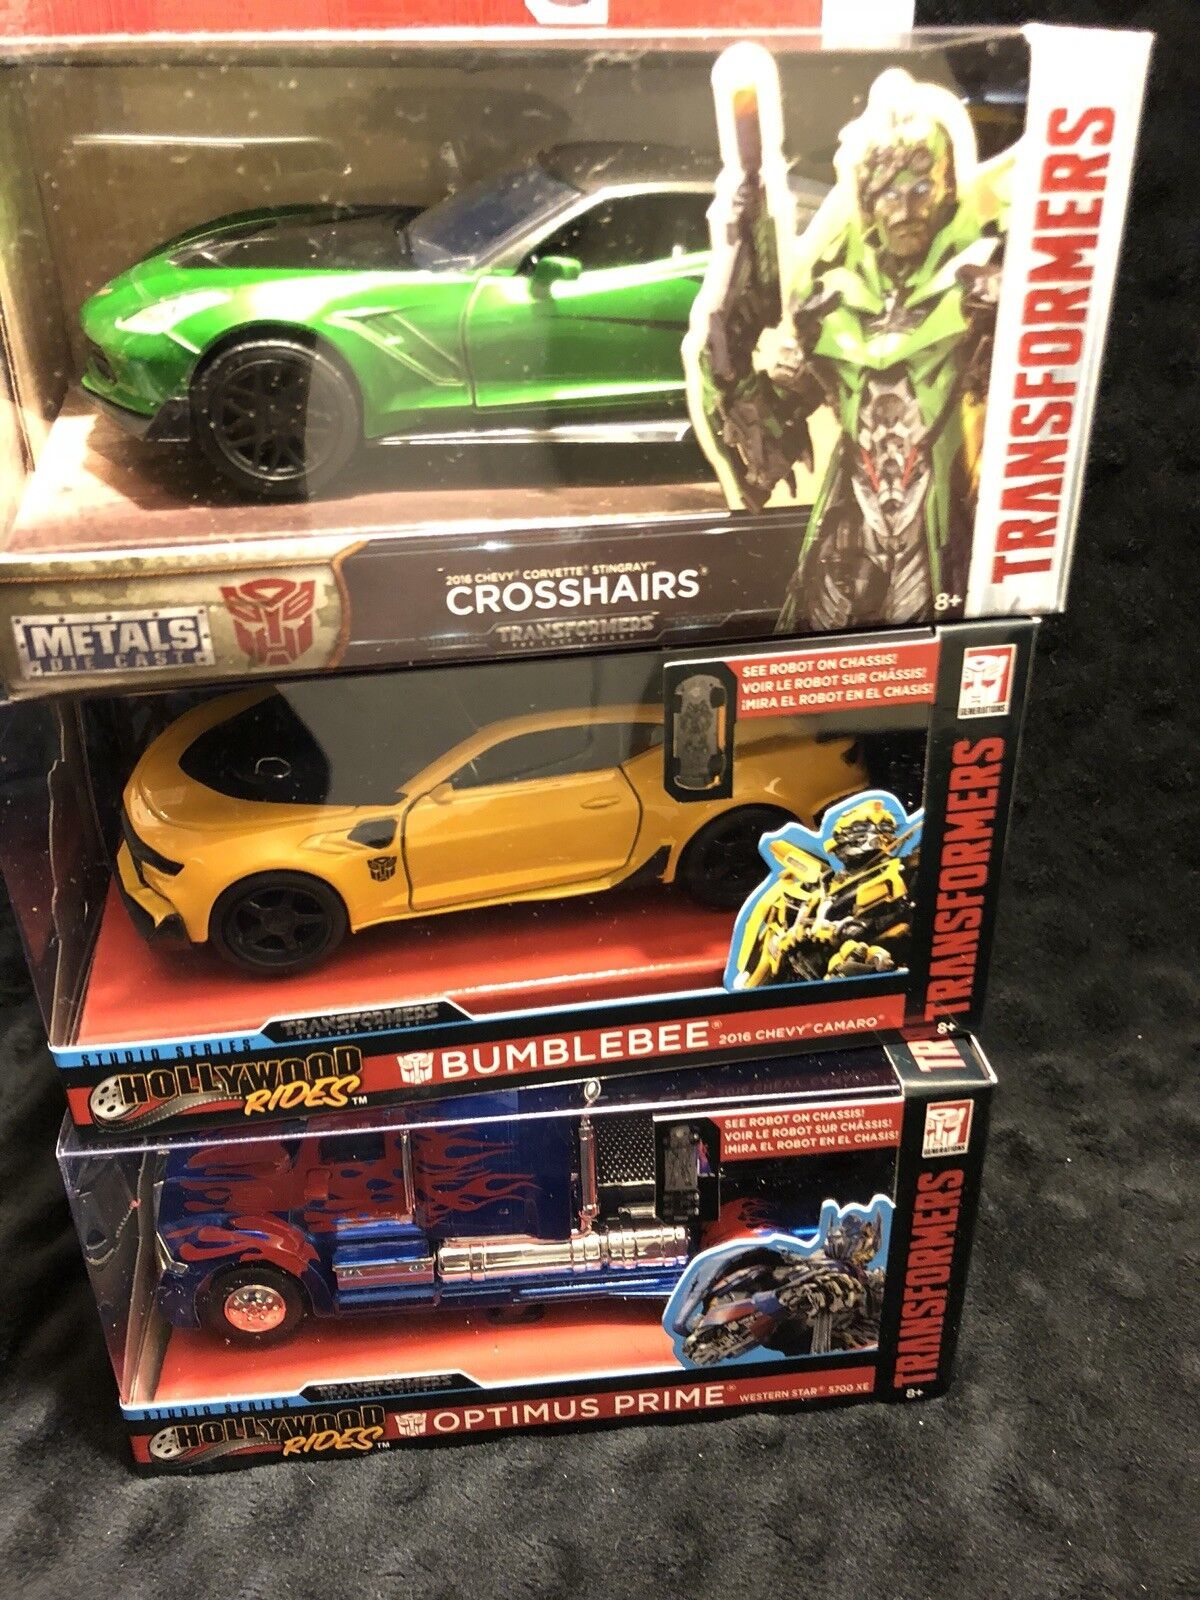 Jada Metals Hollywood Rides Transformers 1 32 Scale